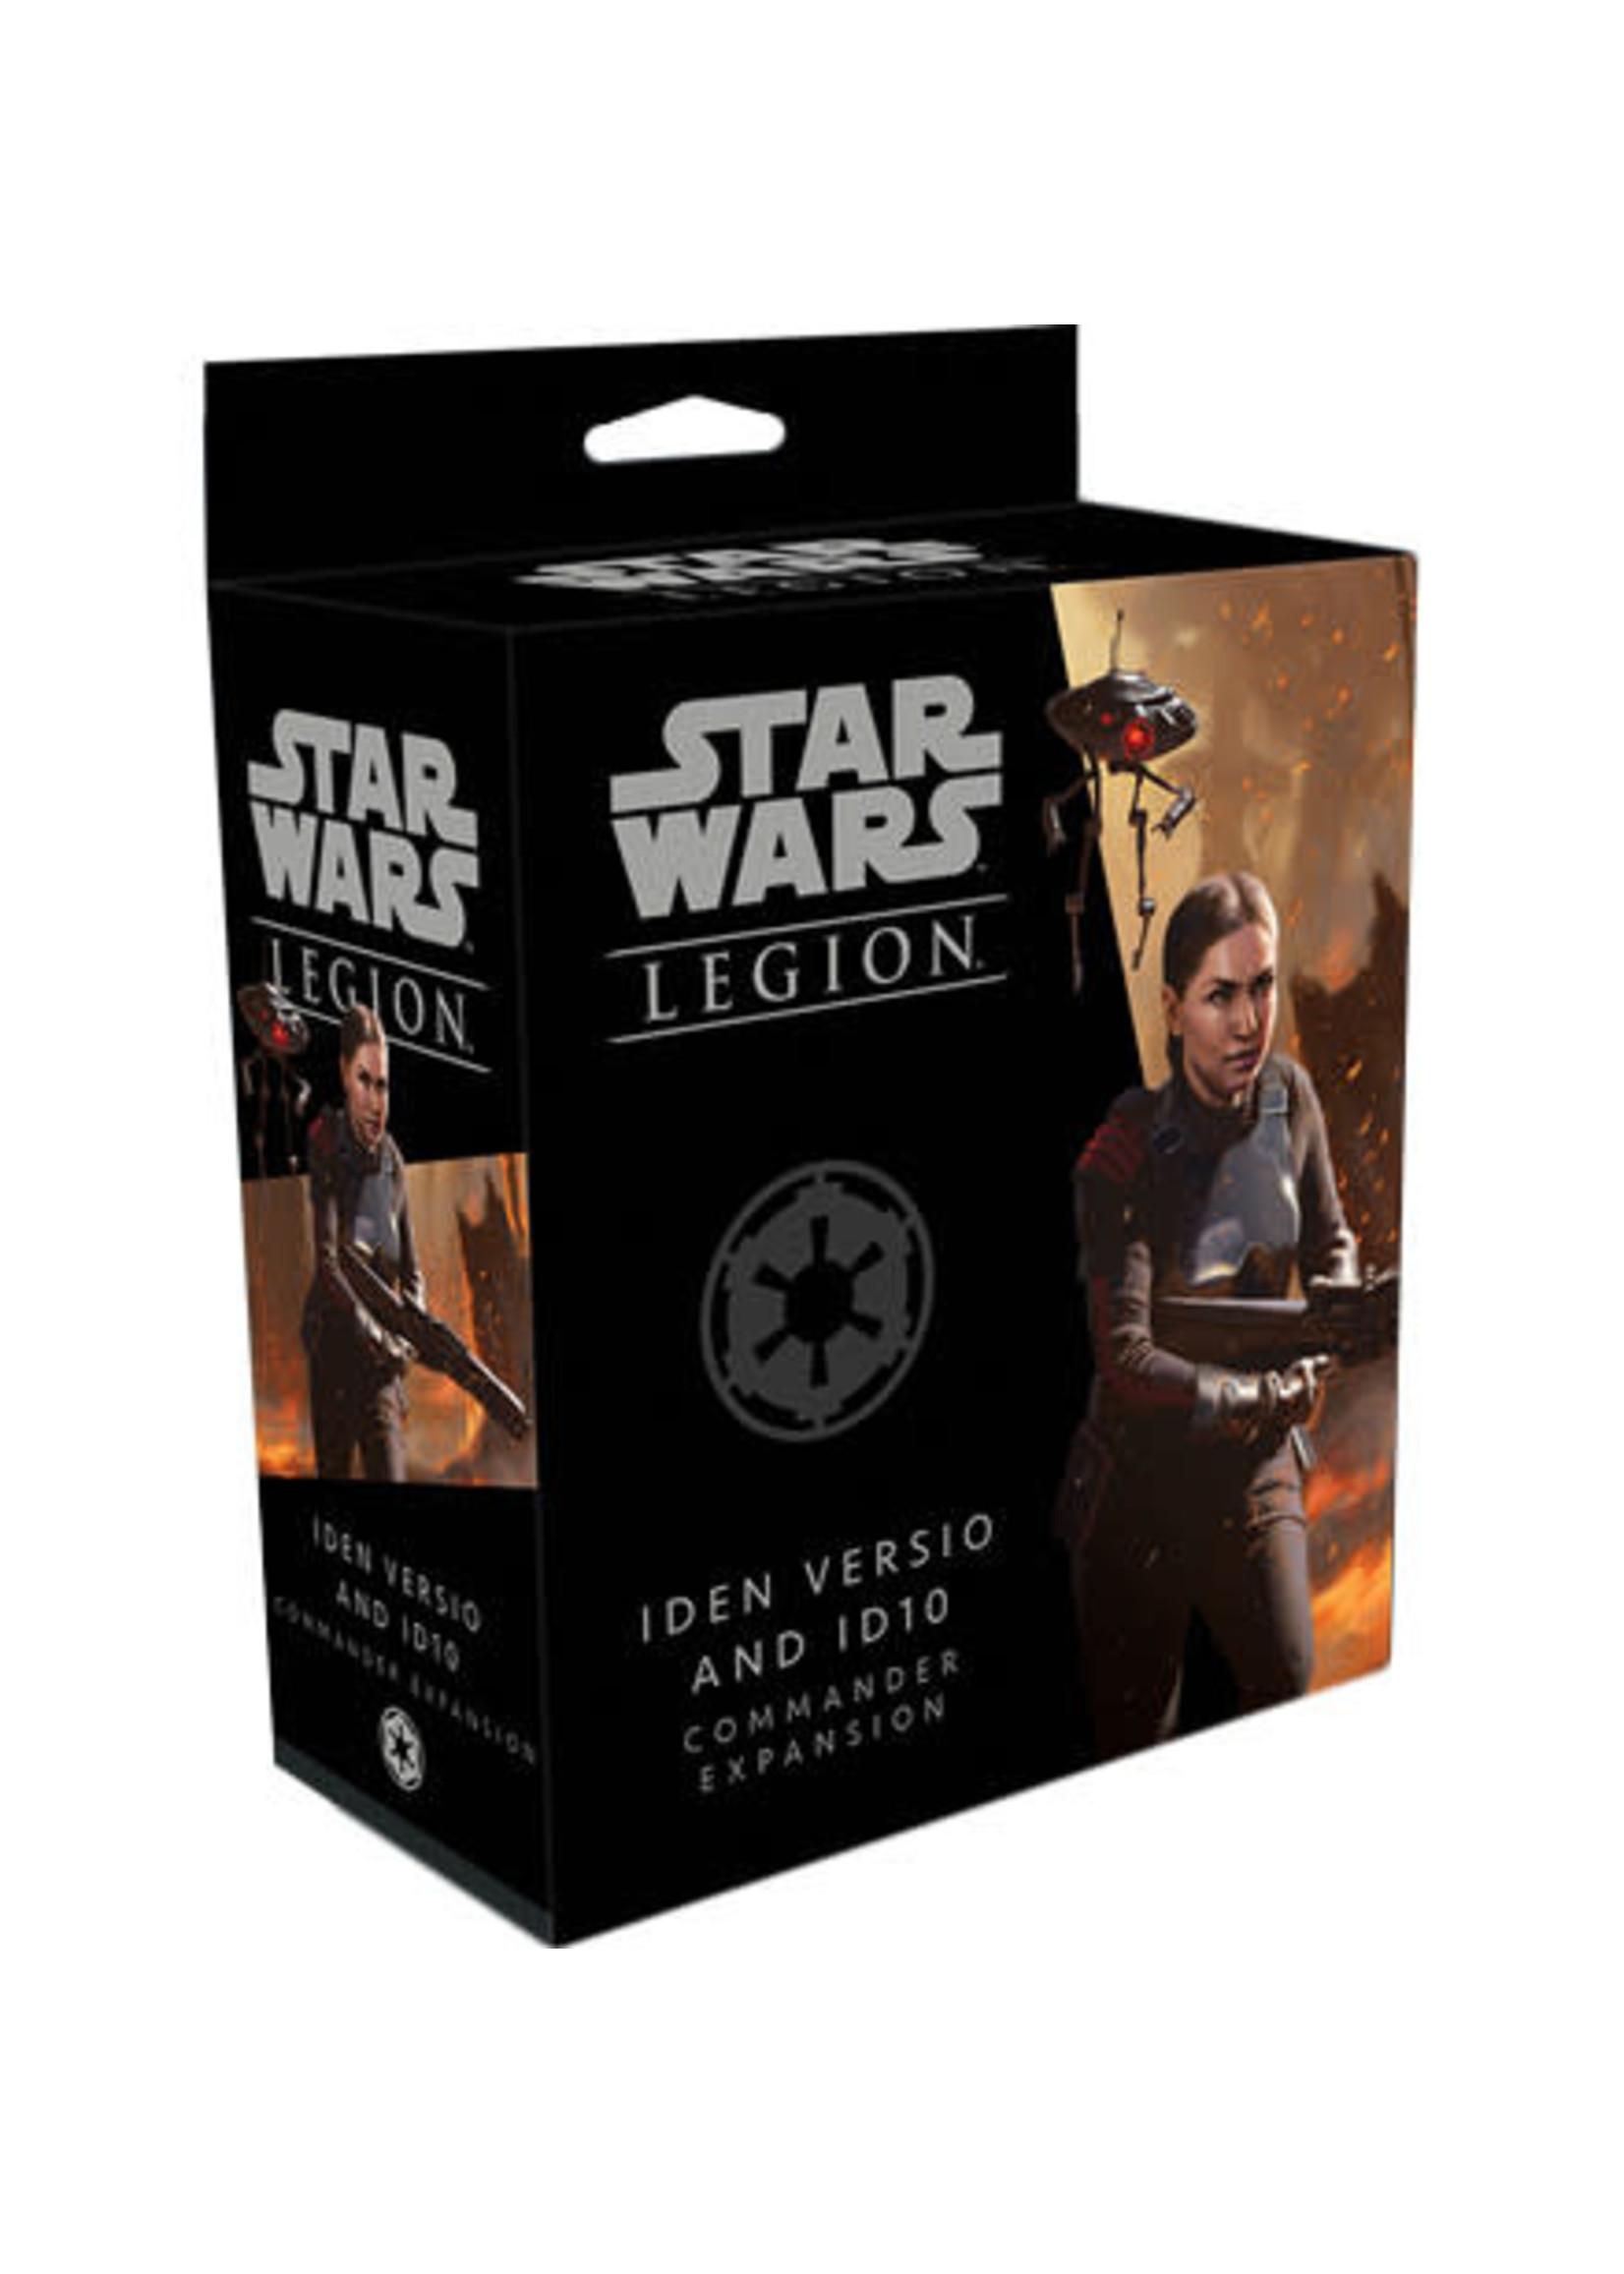 Asmodee Star Wars Legion: Iden Versio and ID10 Commander Expansion